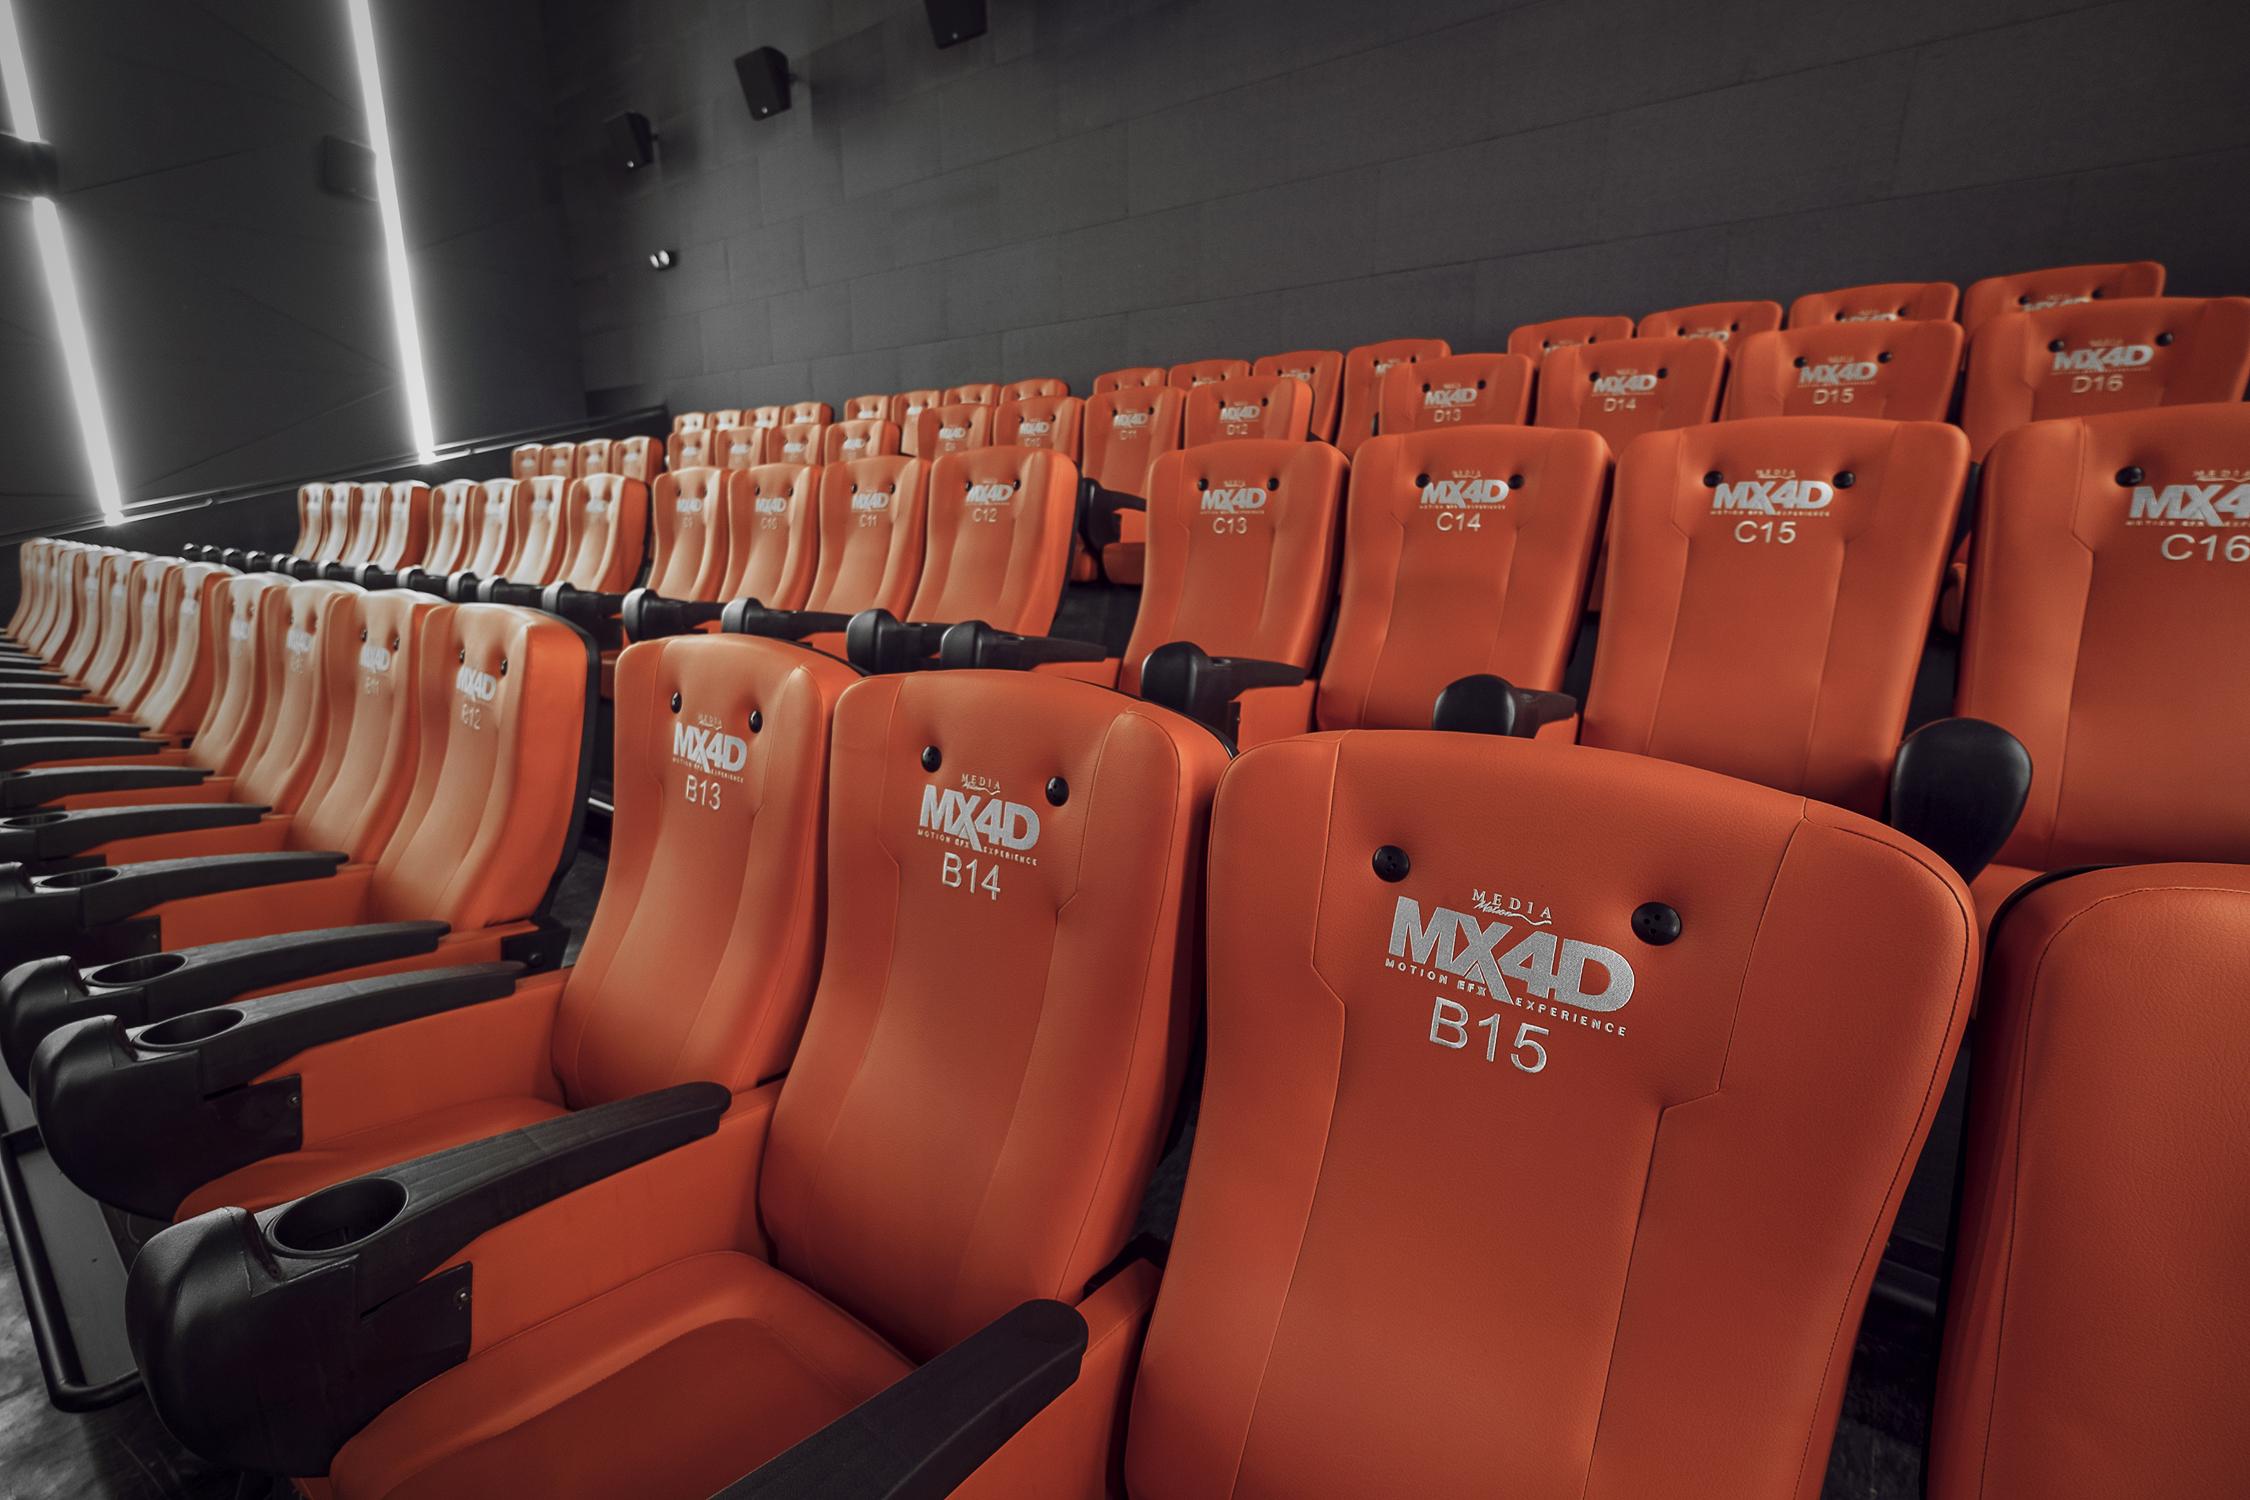 Cinema 1 MX4D